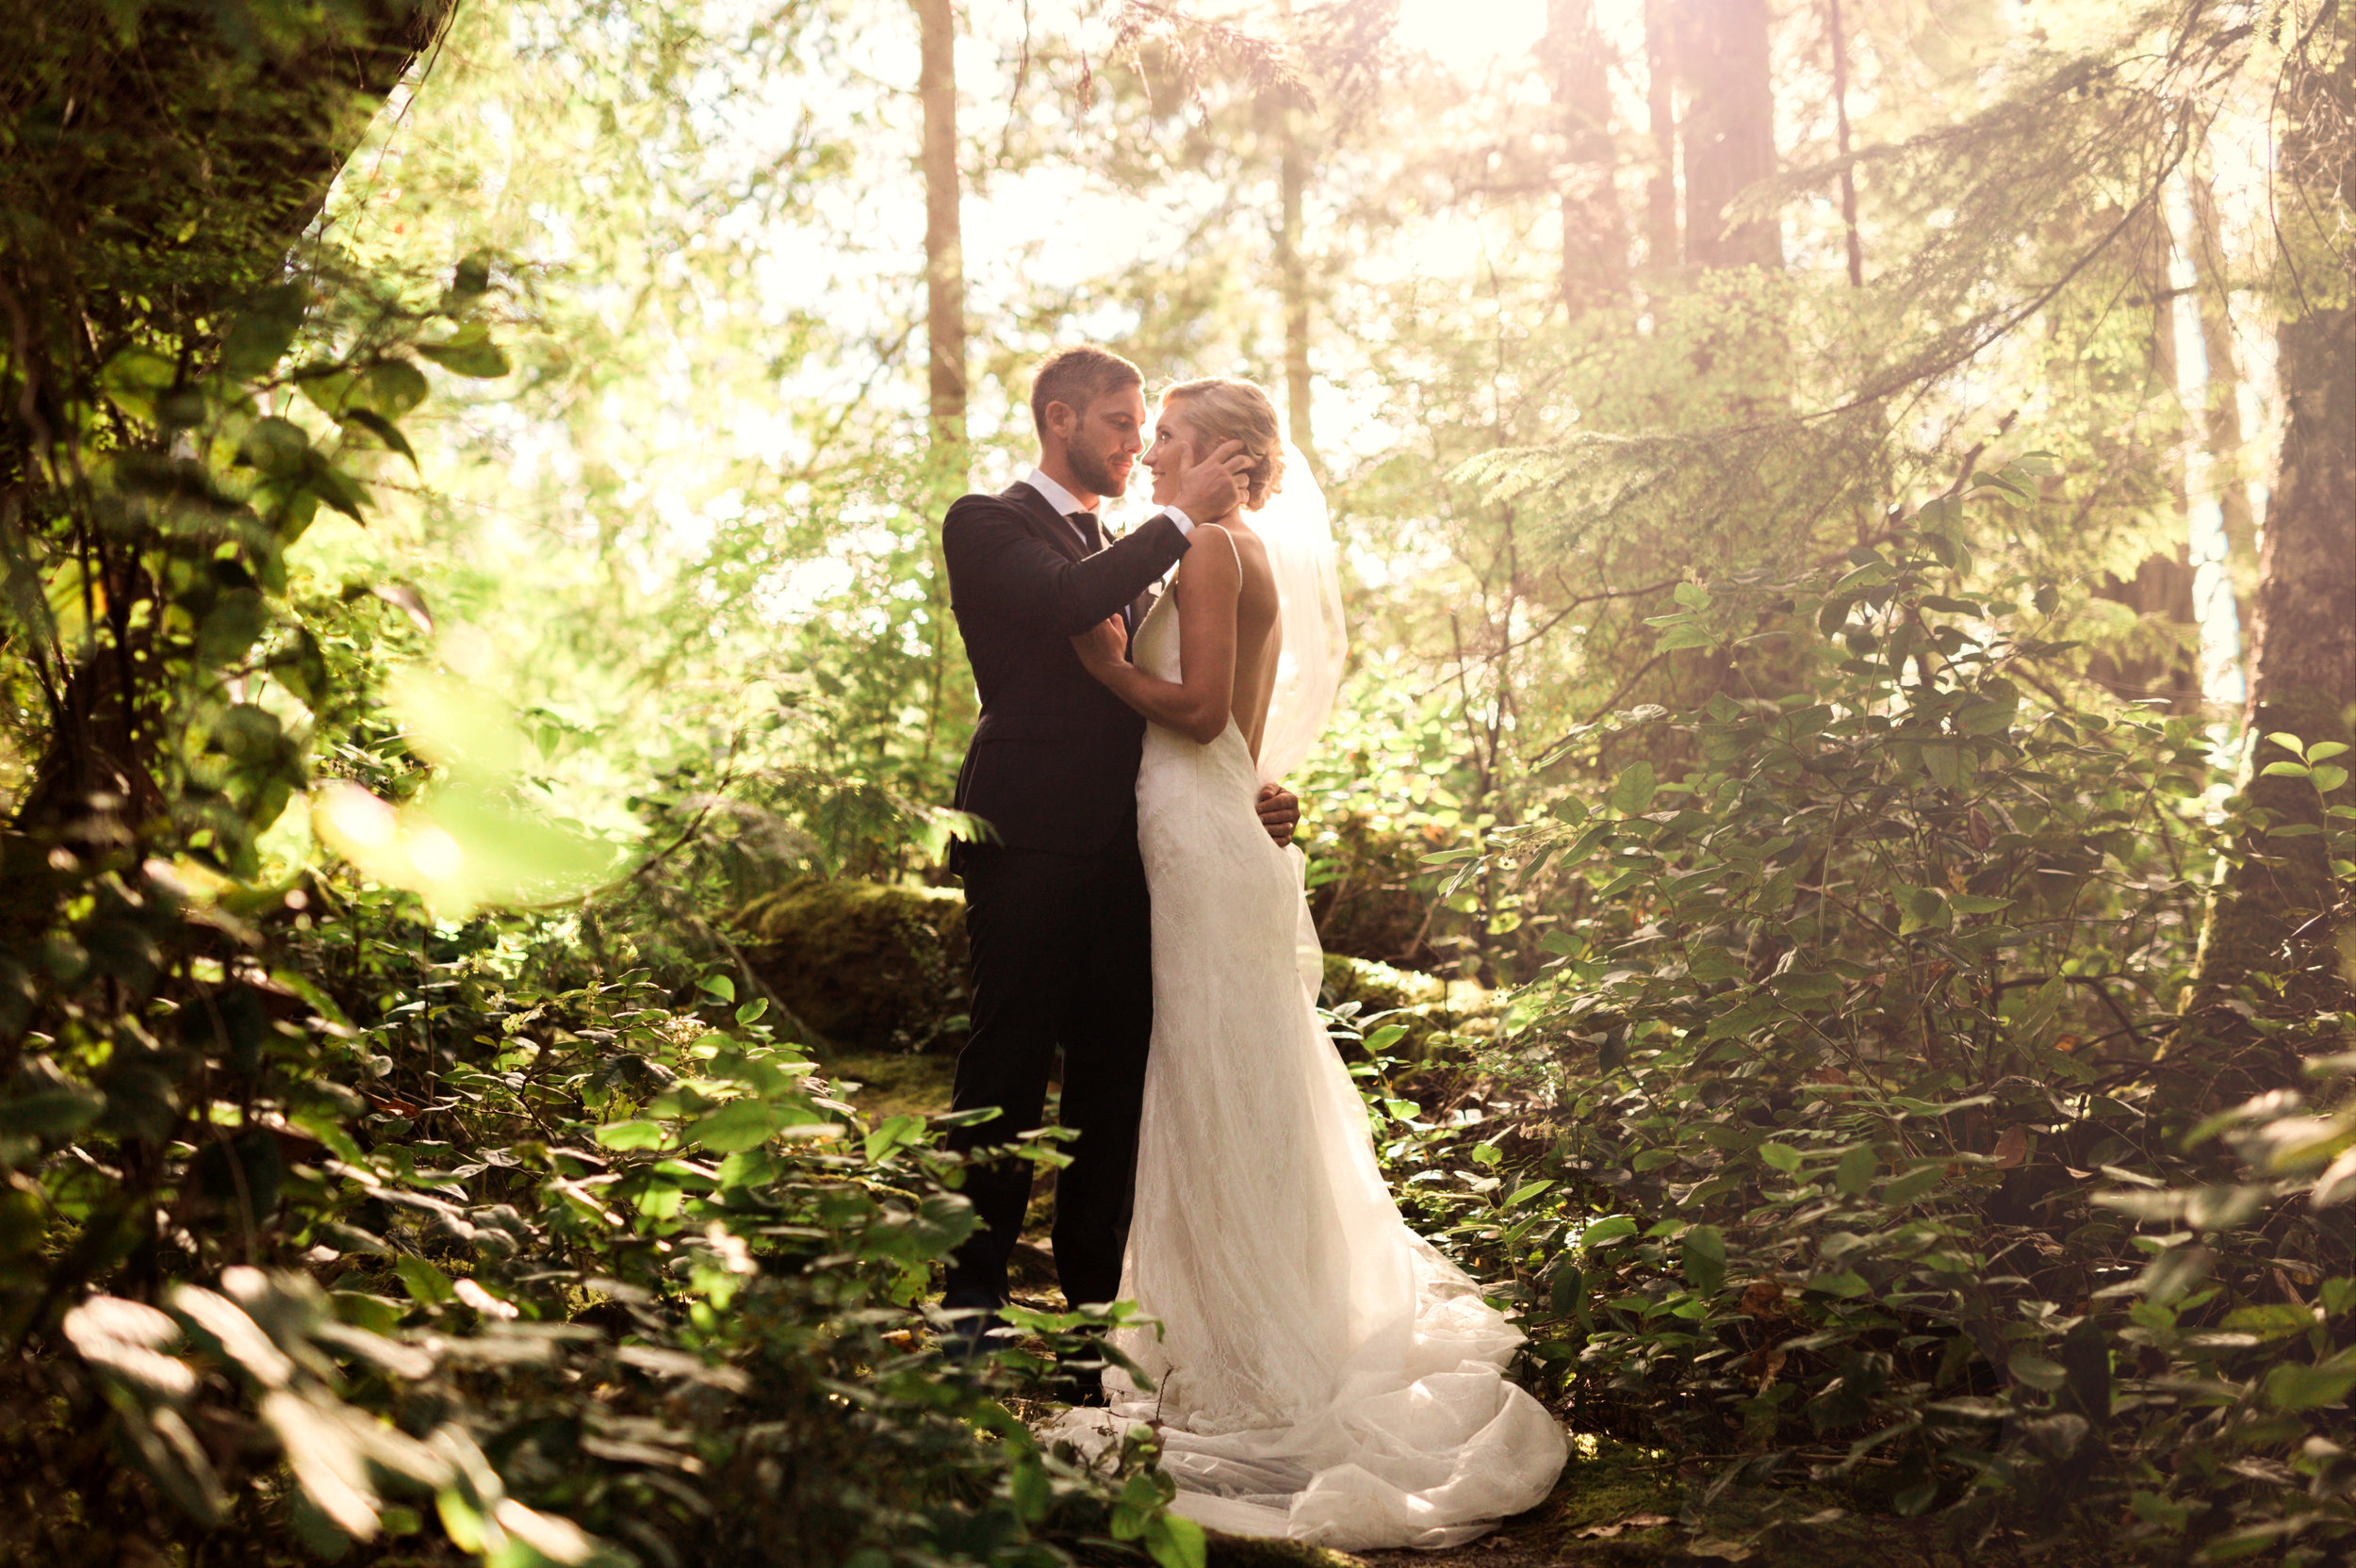 West Coast Wilderness Lodge Wedding - Mary and Matt - Sunshine Coast Wedding Photographer - Jennifer Picard -IMG_4825.jpg